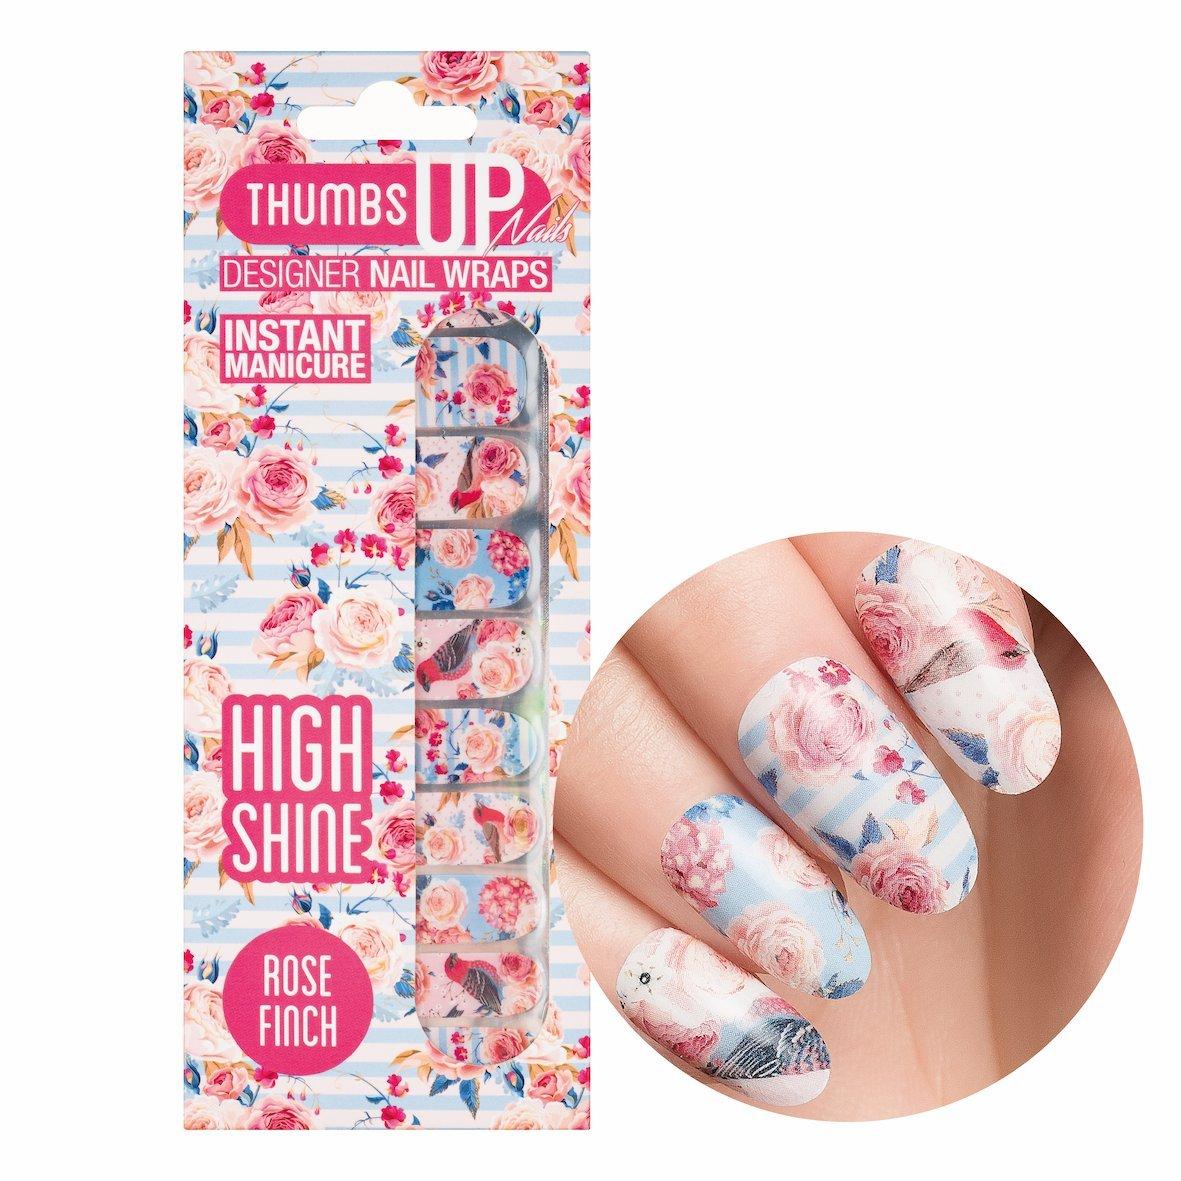 ThumbsUp Nails Rose Finch Vintage Floral Nail Wraps / Self-adhesive ...